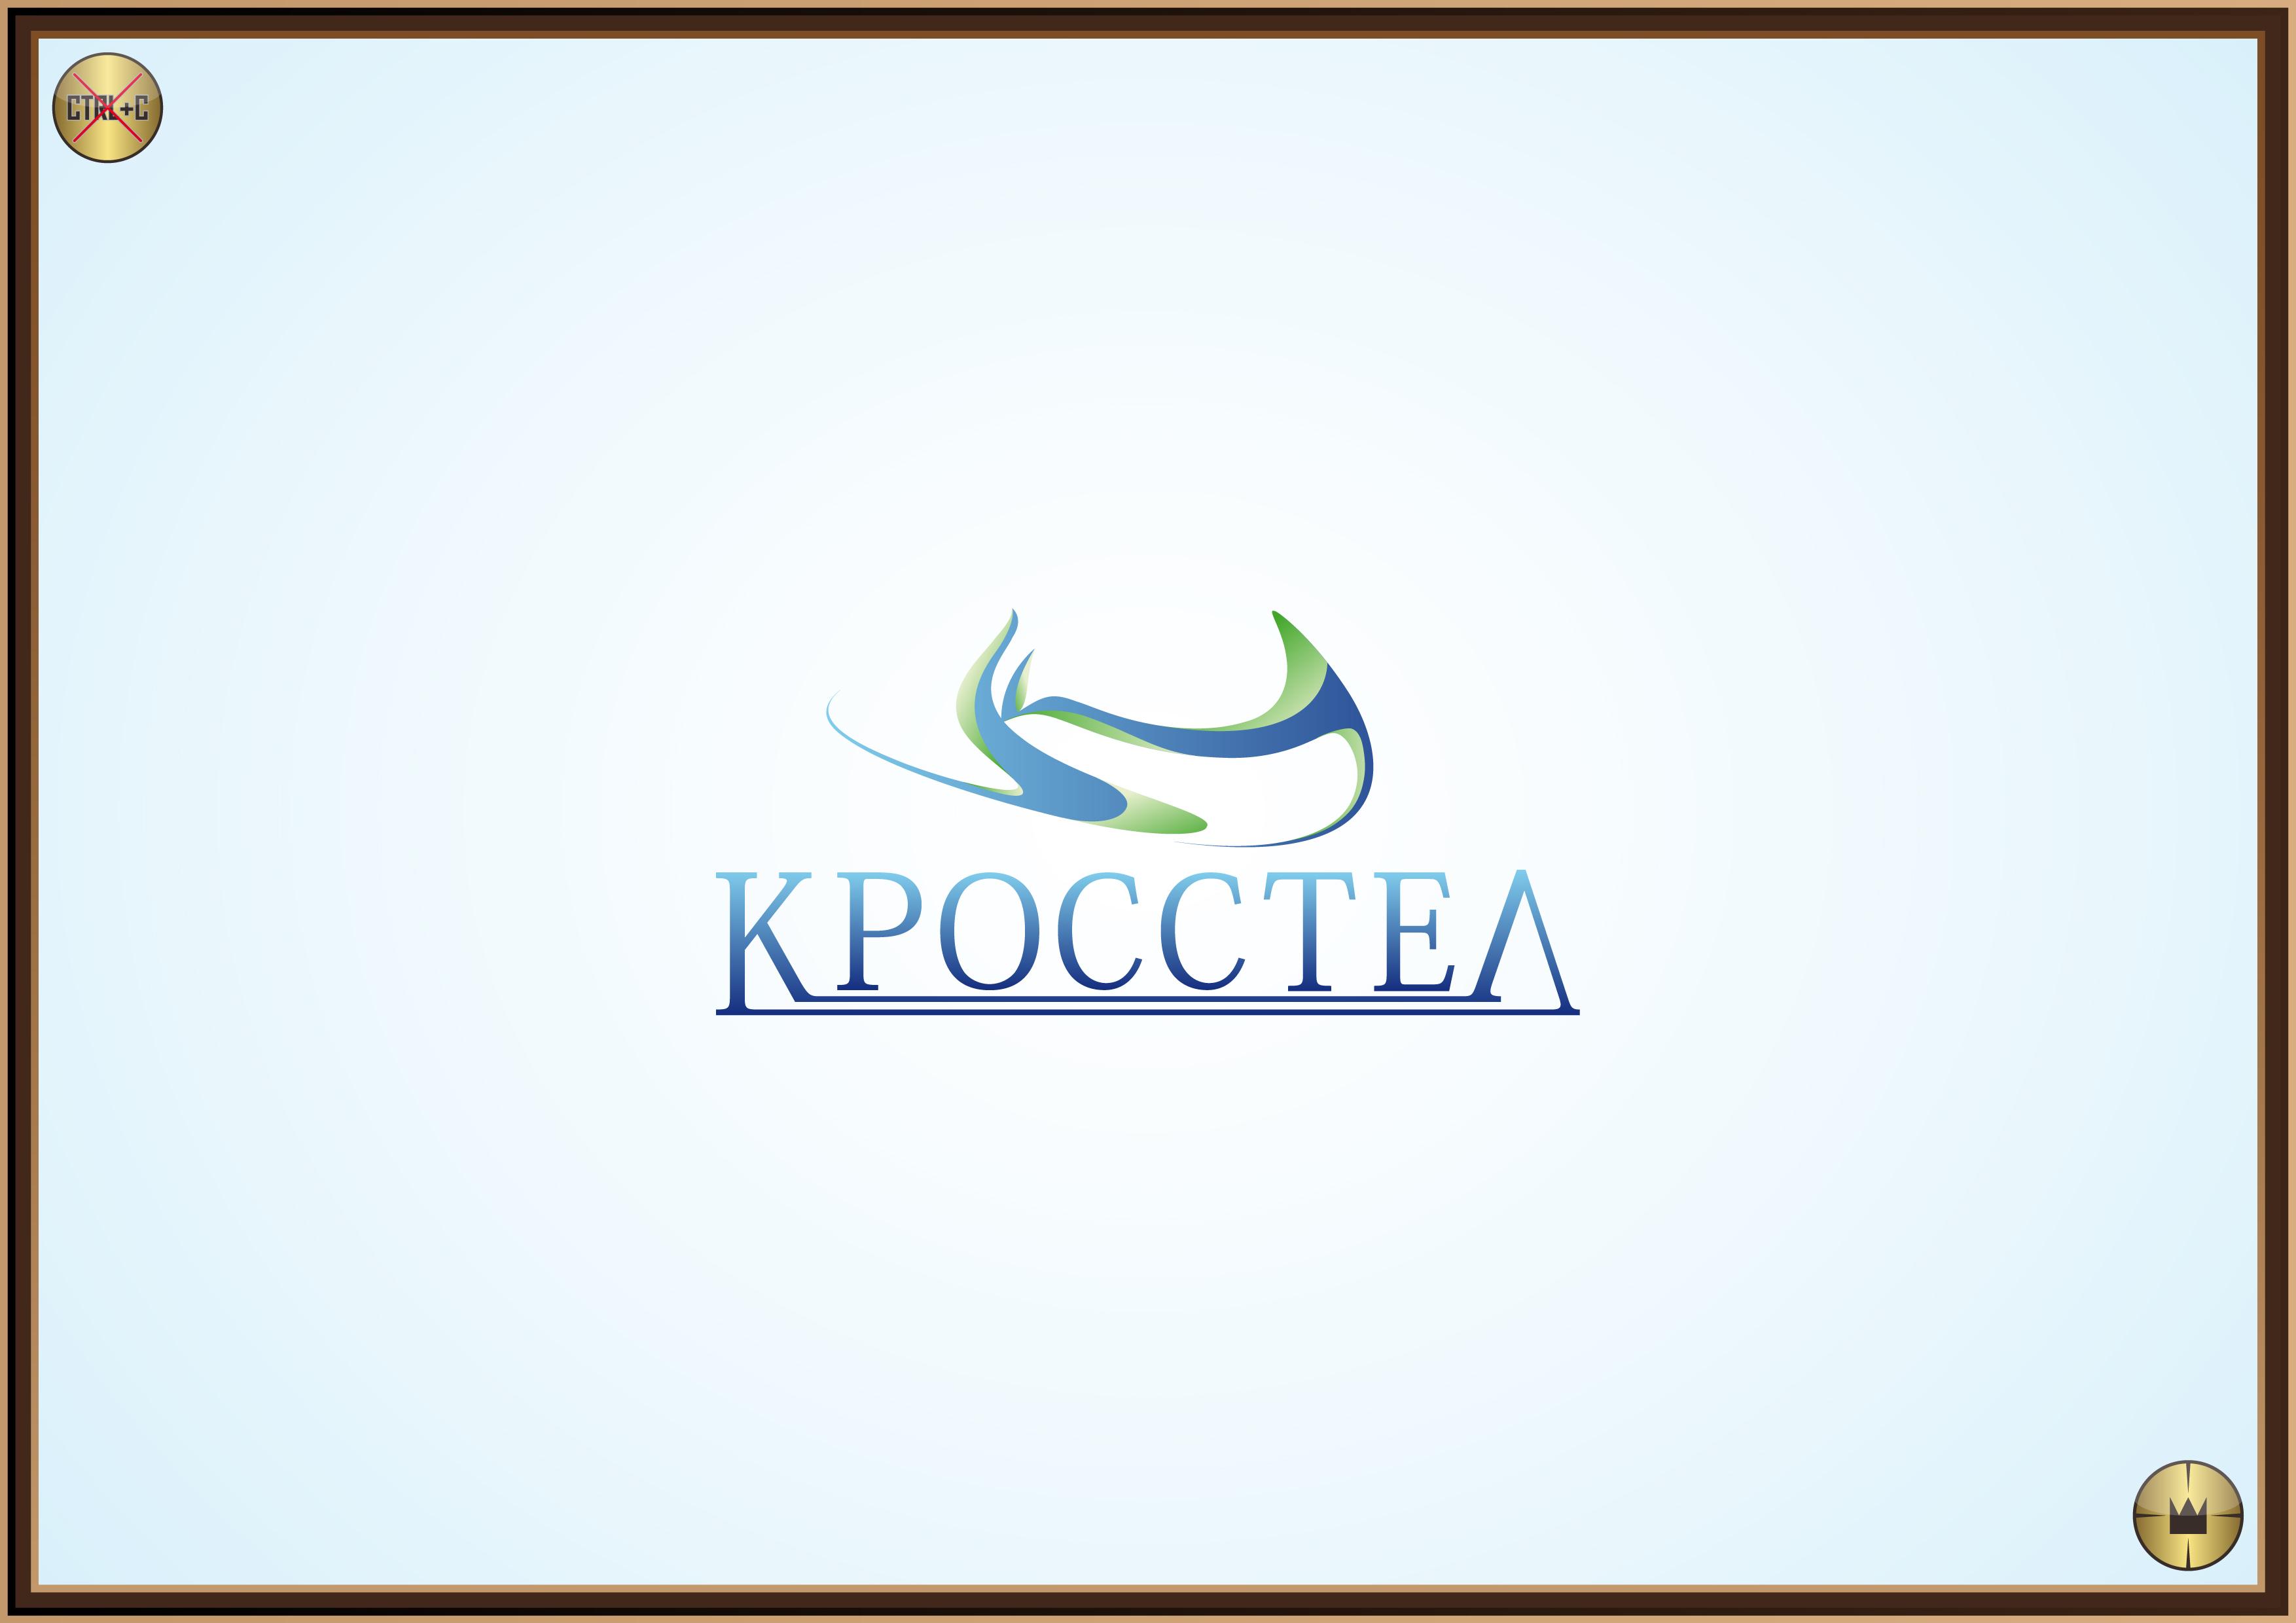 Логотип для компании оператора связи фото f_4ee874a21787b.jpg